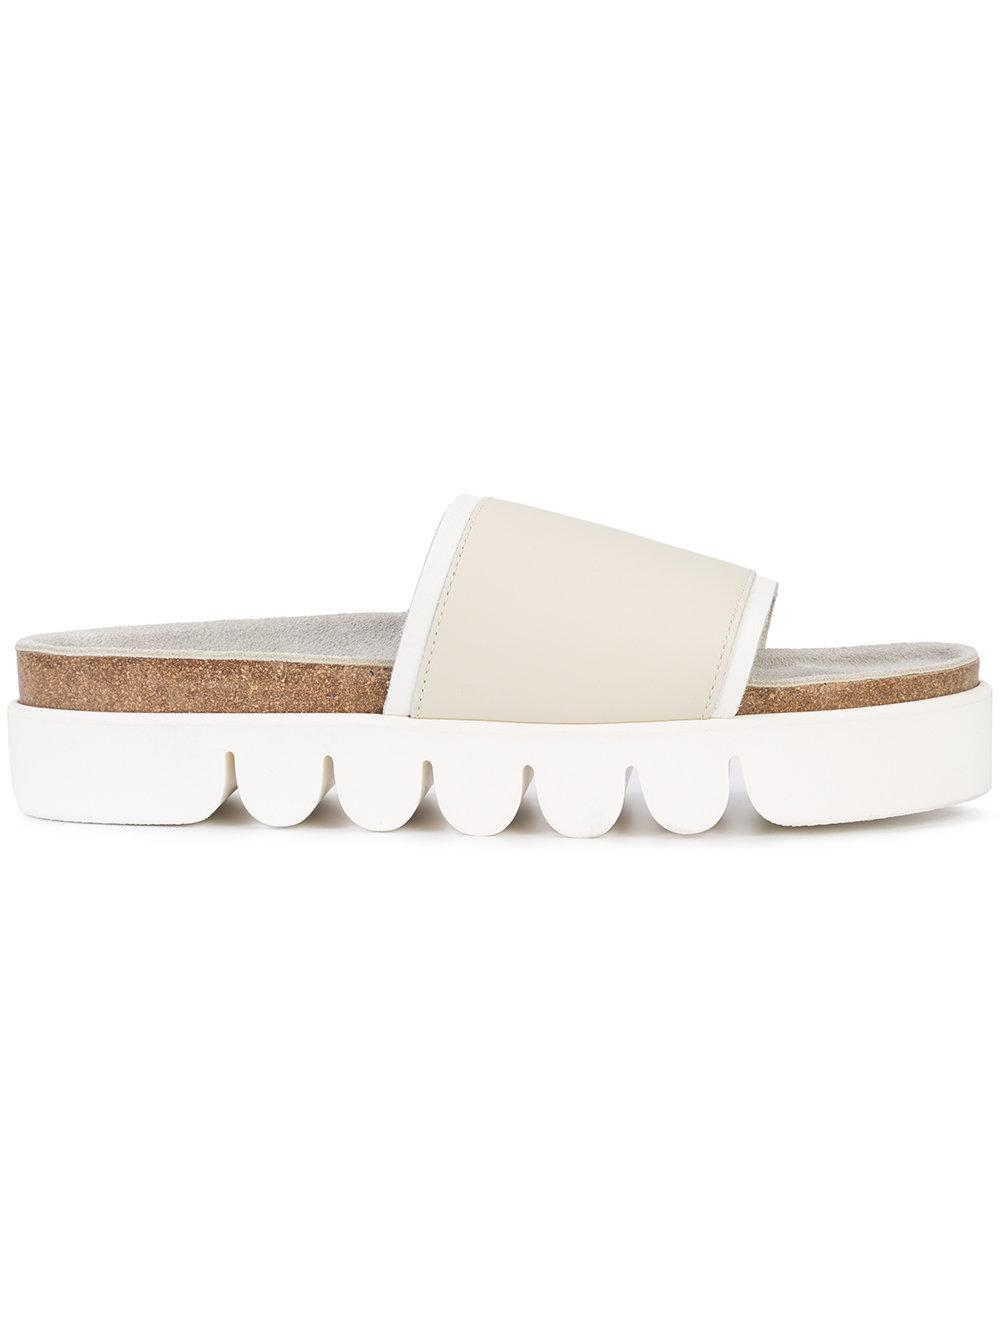 bf4b9577424 Lyst - Hender Scheme Caterpillar Flip Flops in White for Men